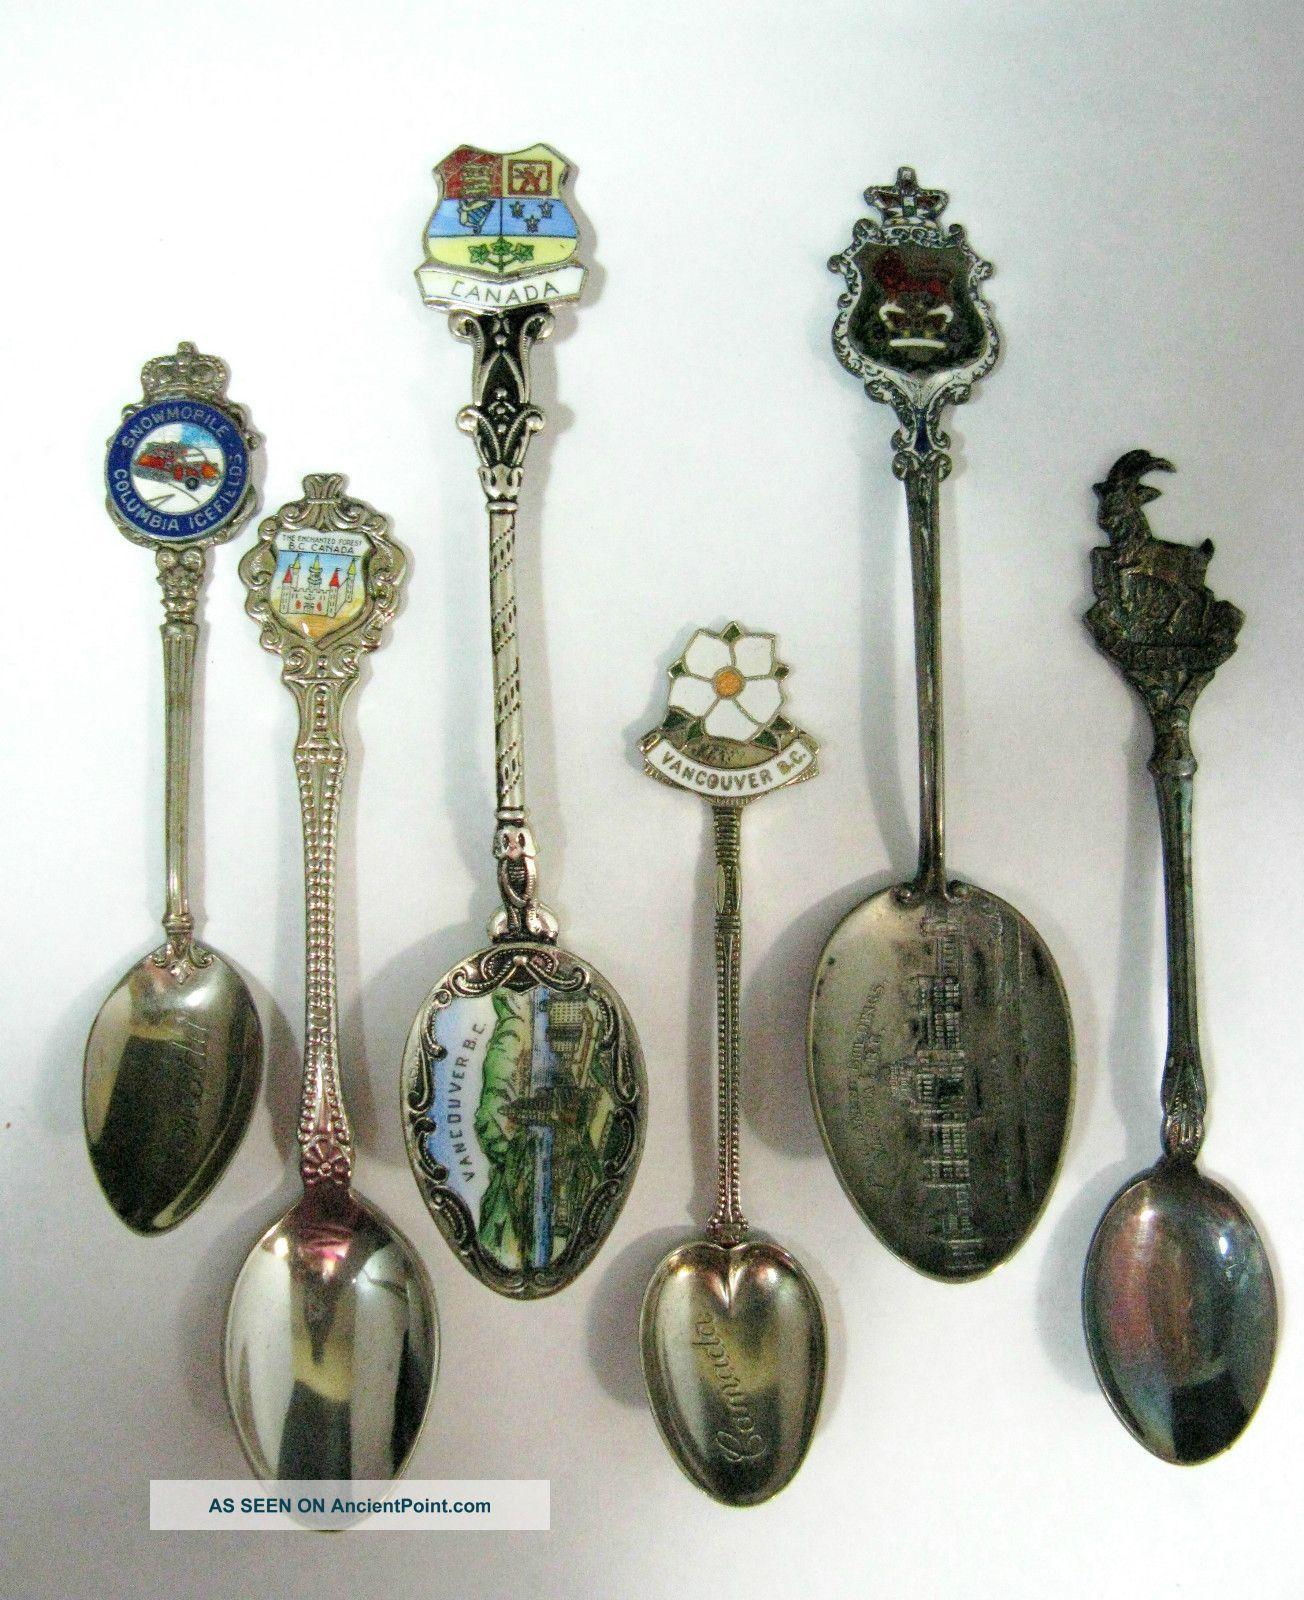 Six Silver & Mixed Metal Canada Souvenir Spoons.  Vintage Condition Souvenir Spoons photo